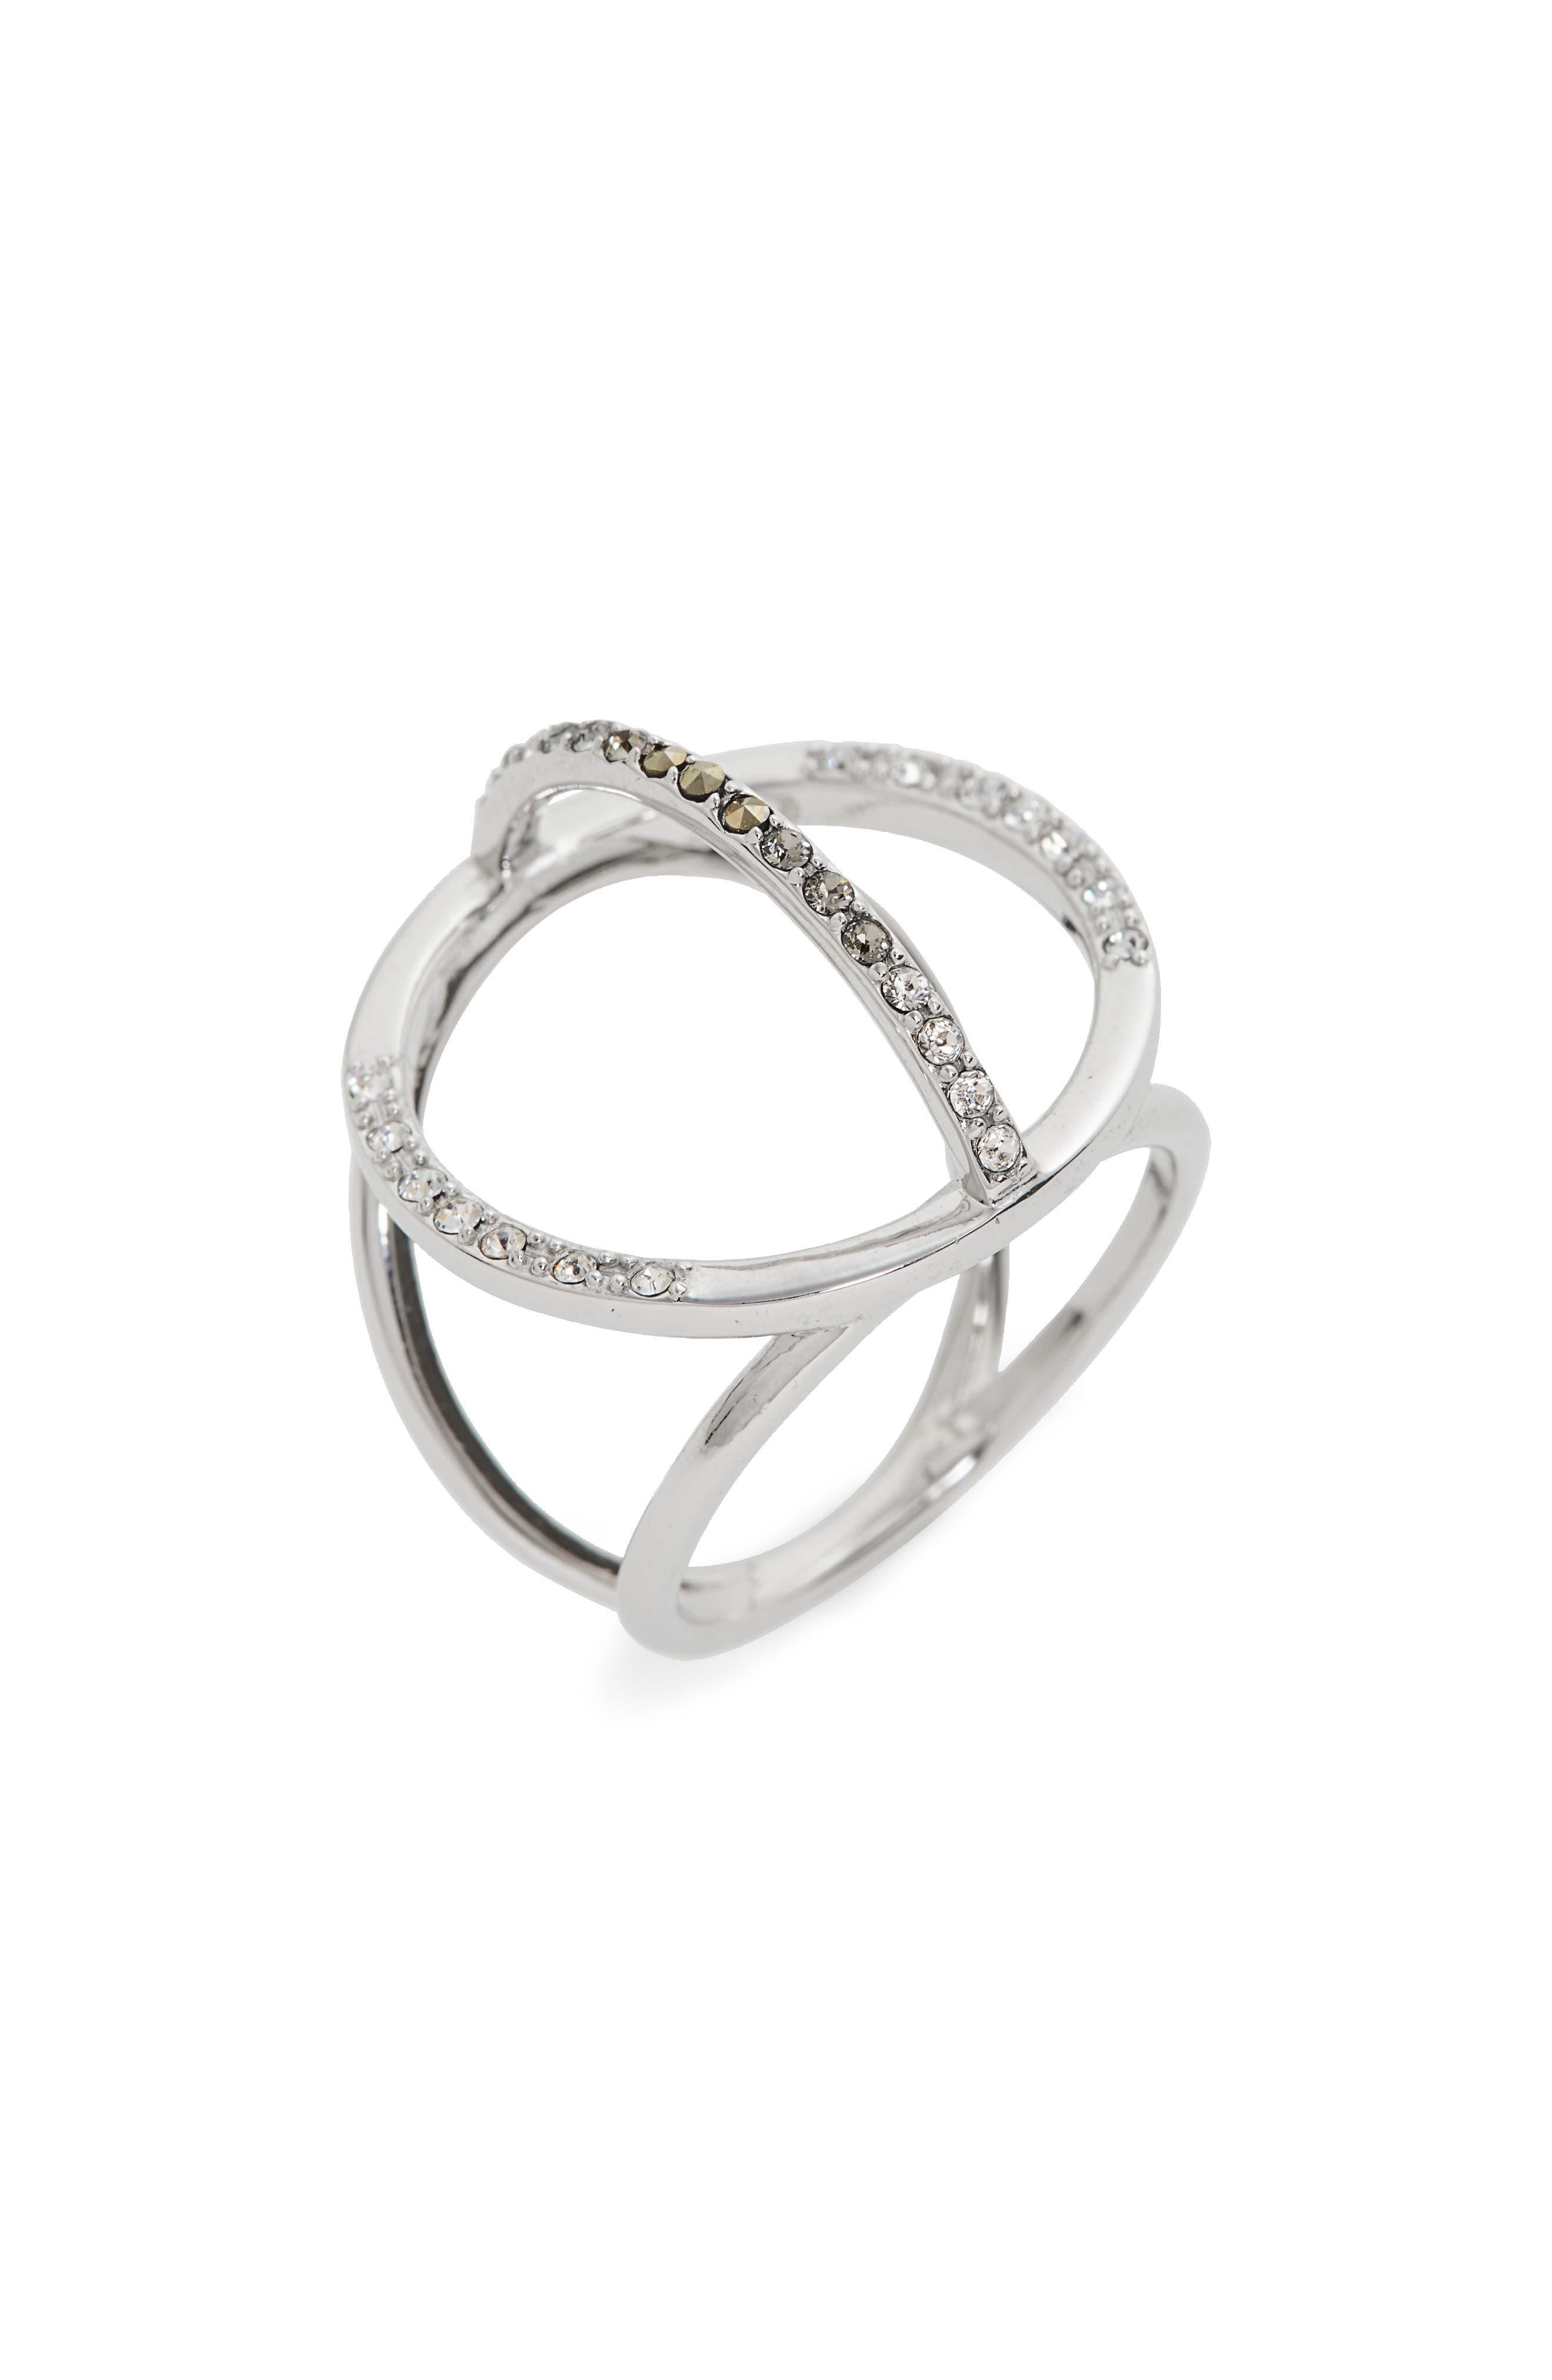 Main Image - Judith Jack Silver Sparkle Circle Ring